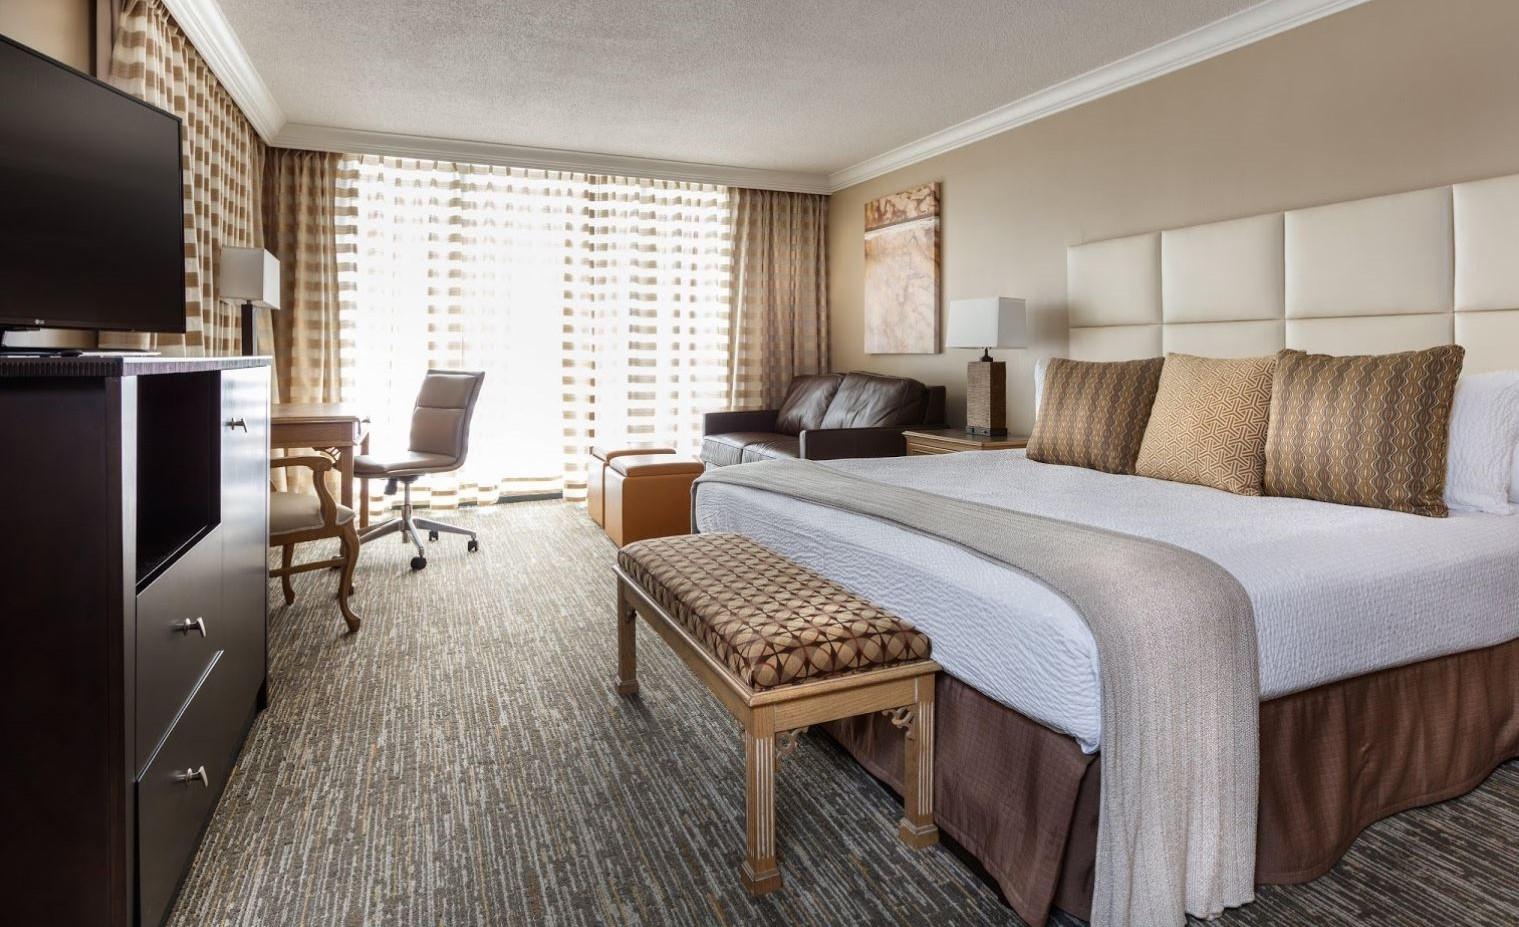 san luis resort spa and conference center galveston. Black Bedroom Furniture Sets. Home Design Ideas